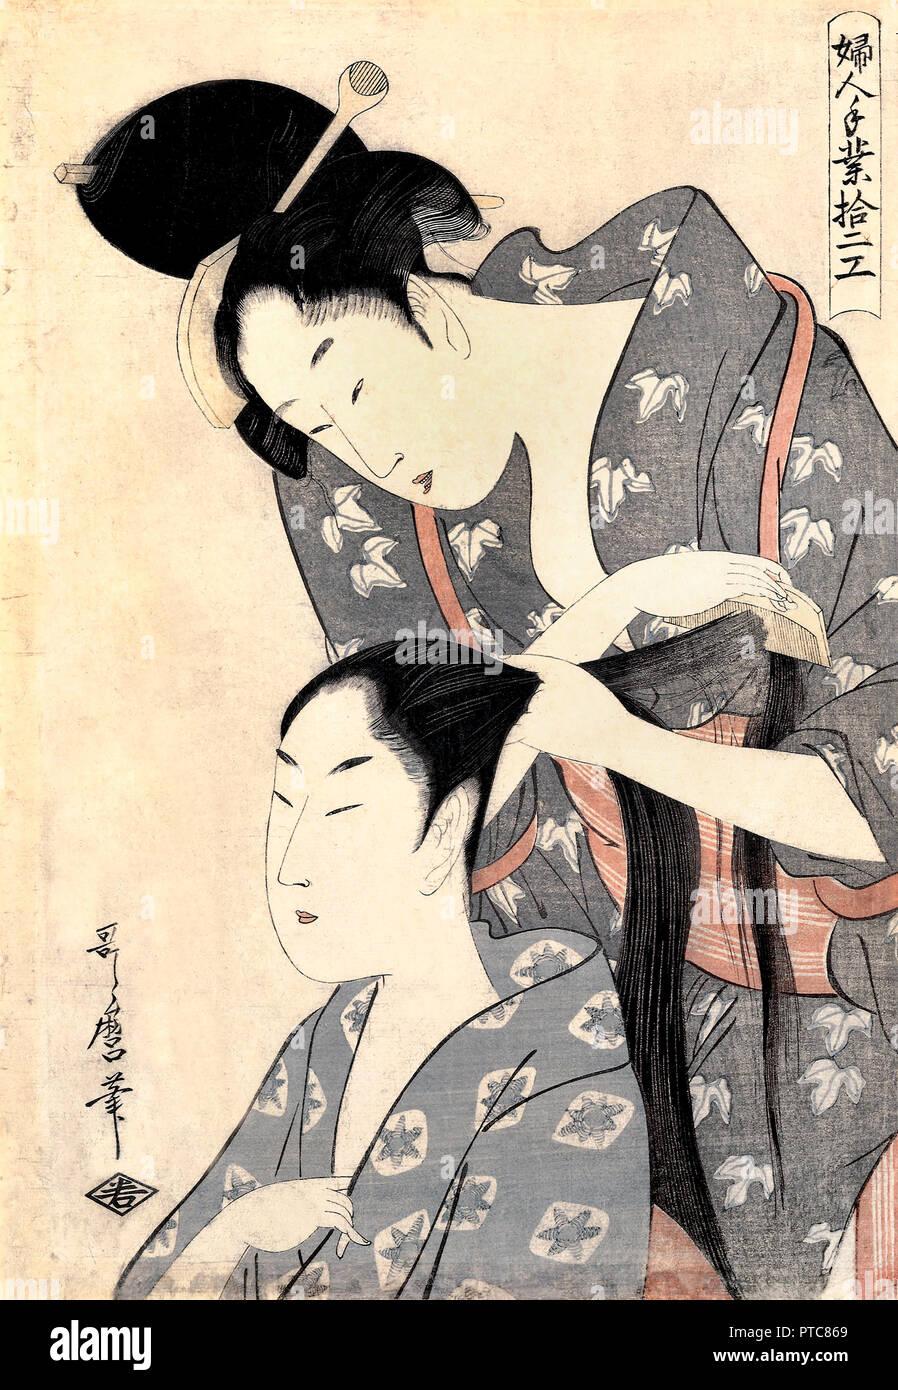 Kitagawa Utamaro, Hairdresser / Kamiyui Circa 1799, Woodblock prints on paper, Art Gallery of South Australia. - Stock Image